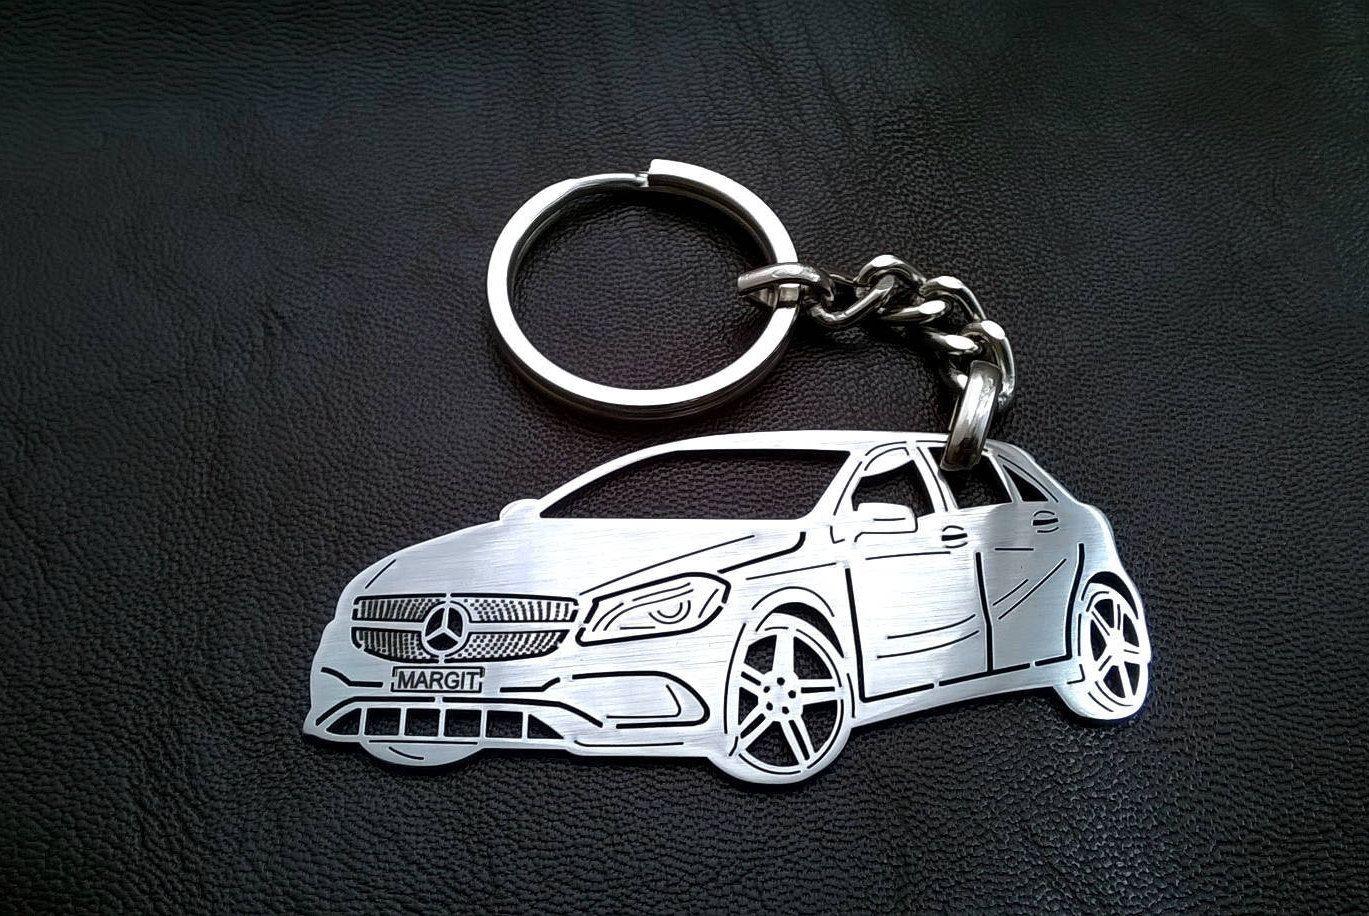 Mercedes w176 keychain mercedes a class keychain mercedes a class personalized key chain